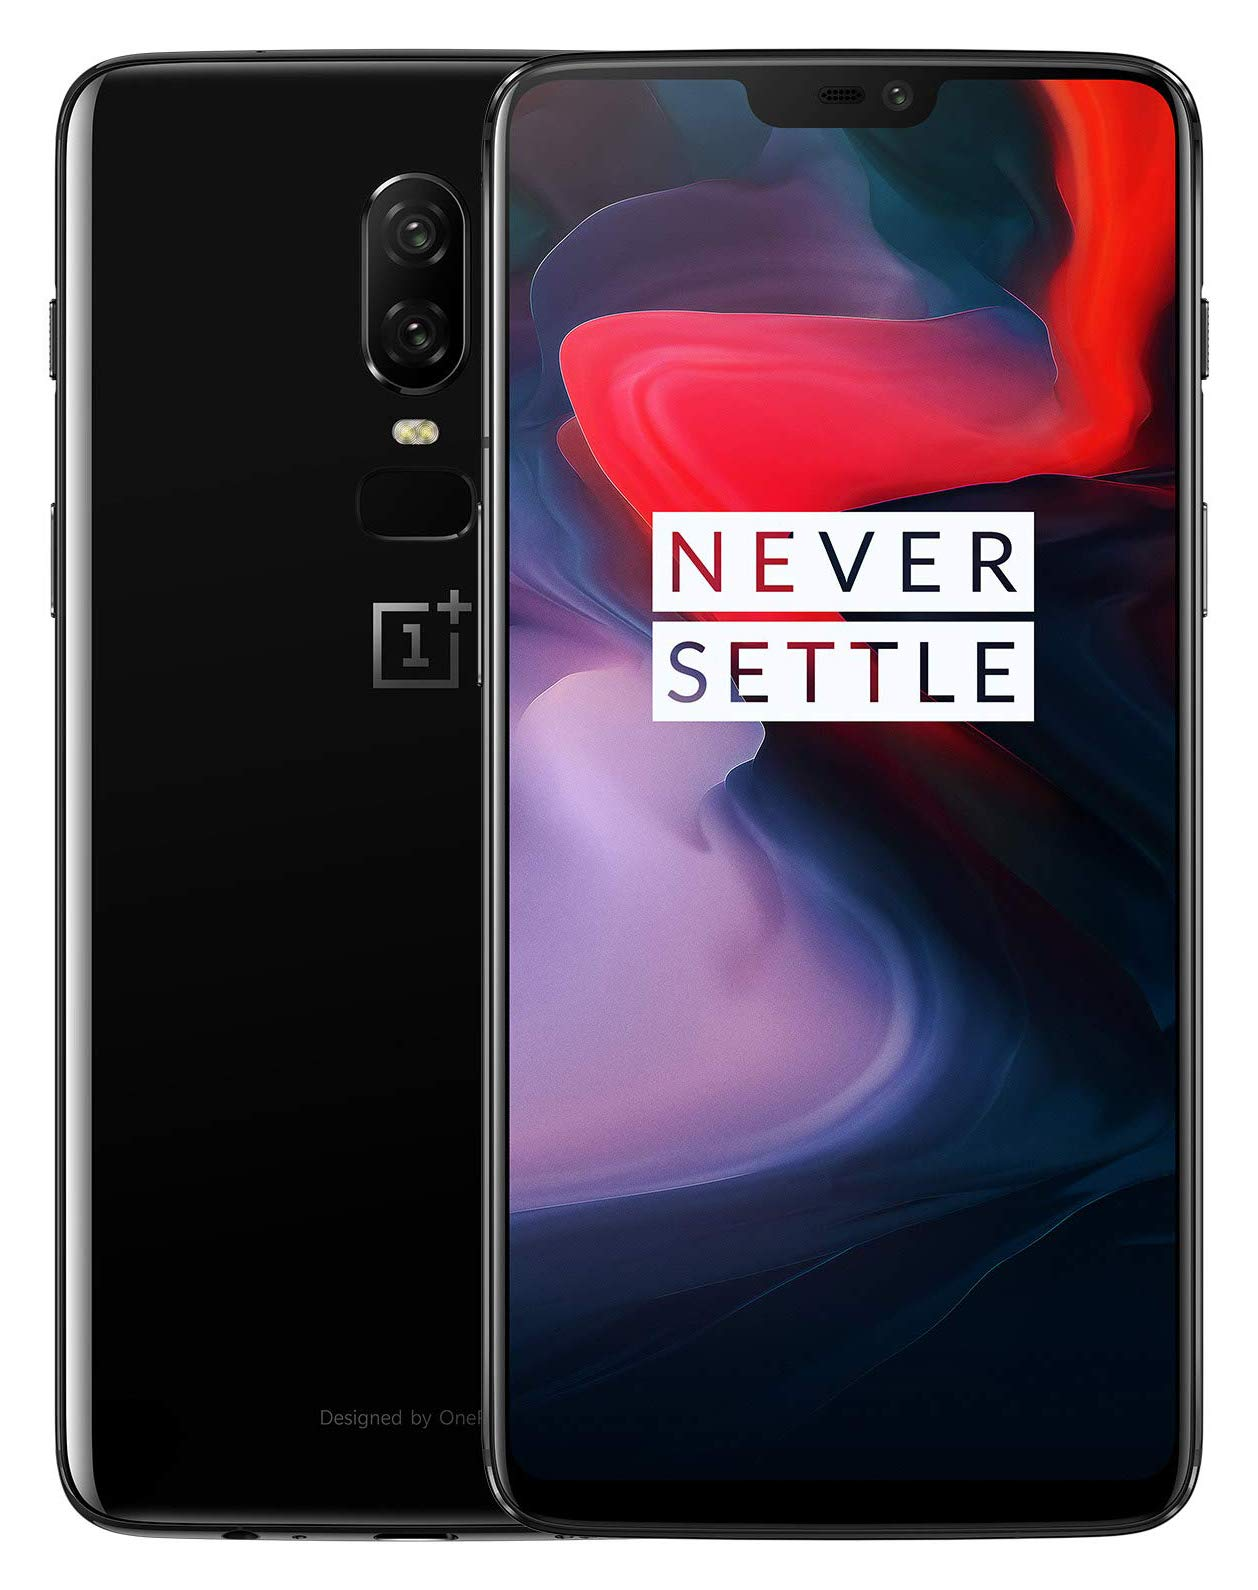 "OnePlus Factory Unlocked Phone - 6.28"" Screen - 64GB - Mirror Black"